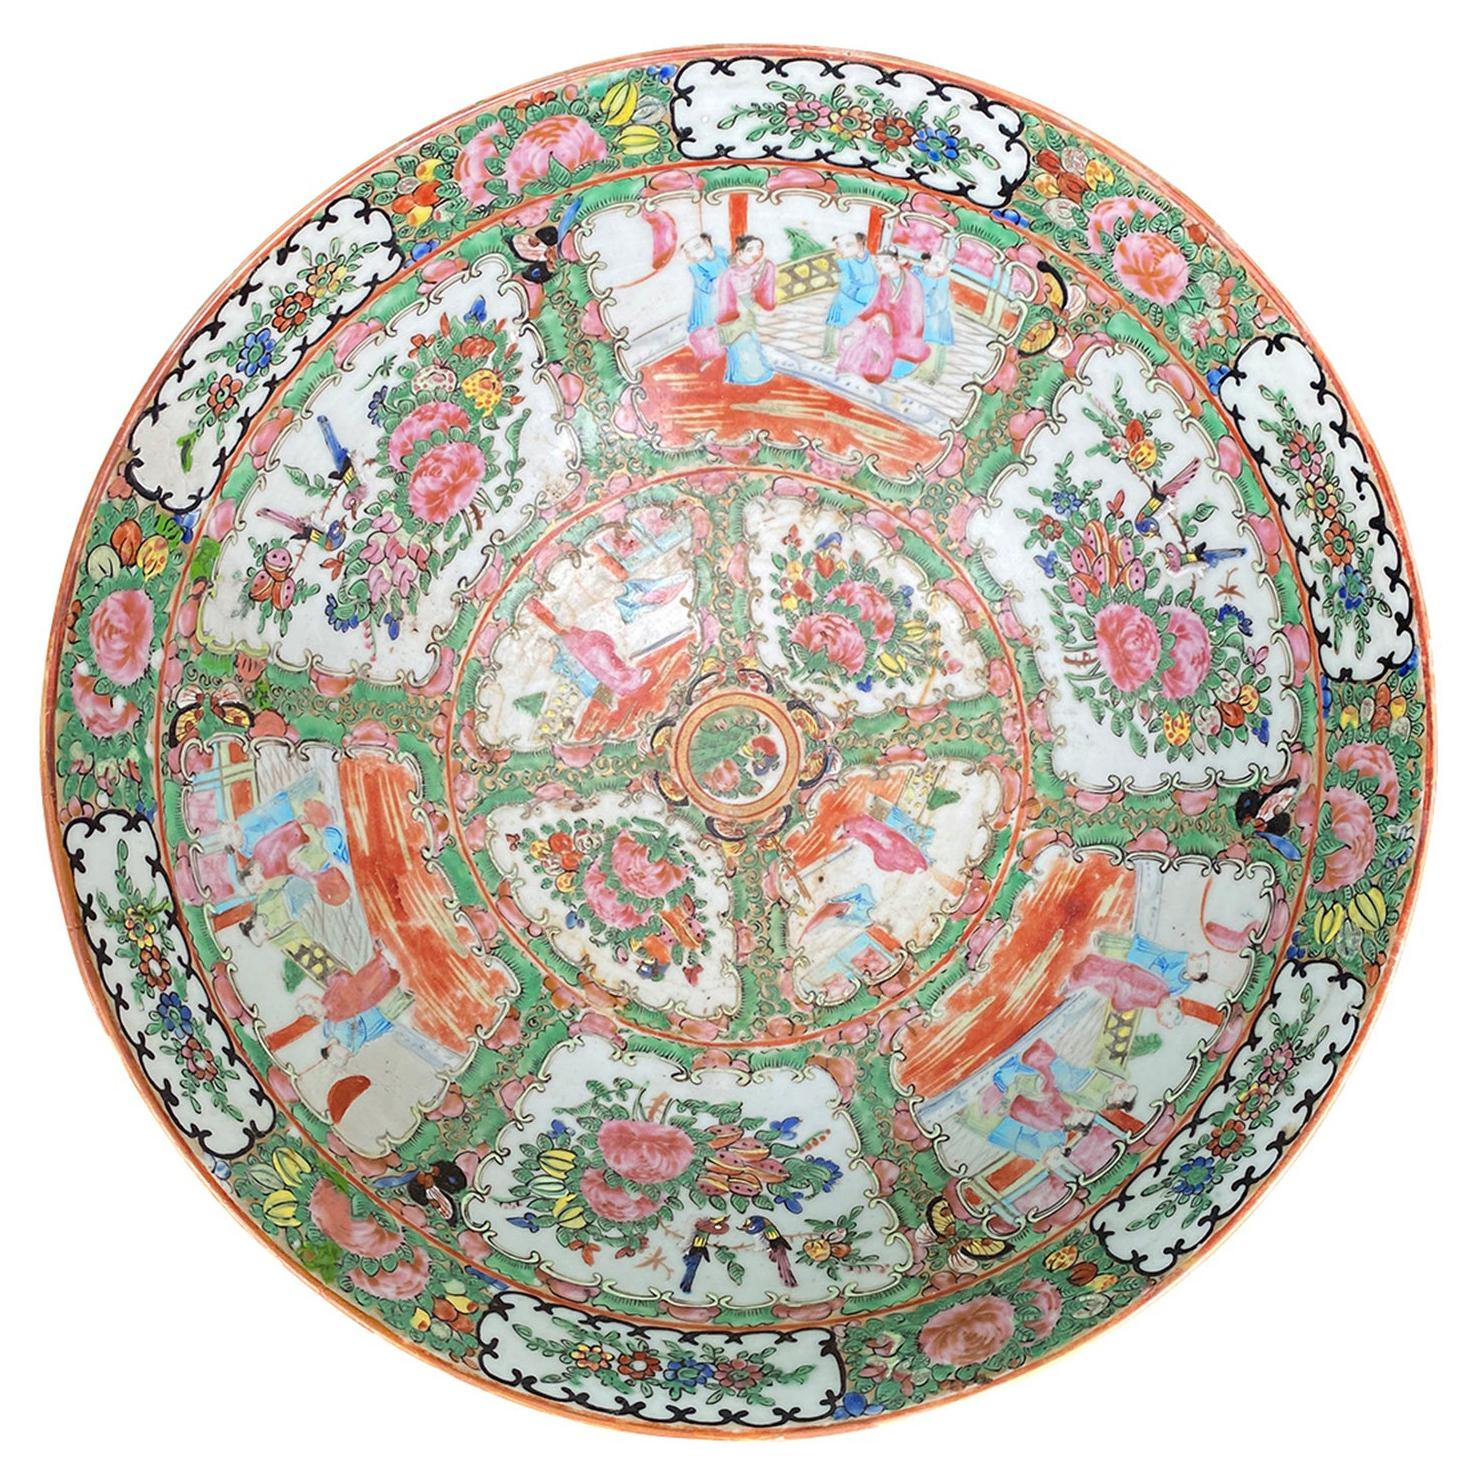 19th Century Rose Medallion Porcelain Bowl, Unmarked